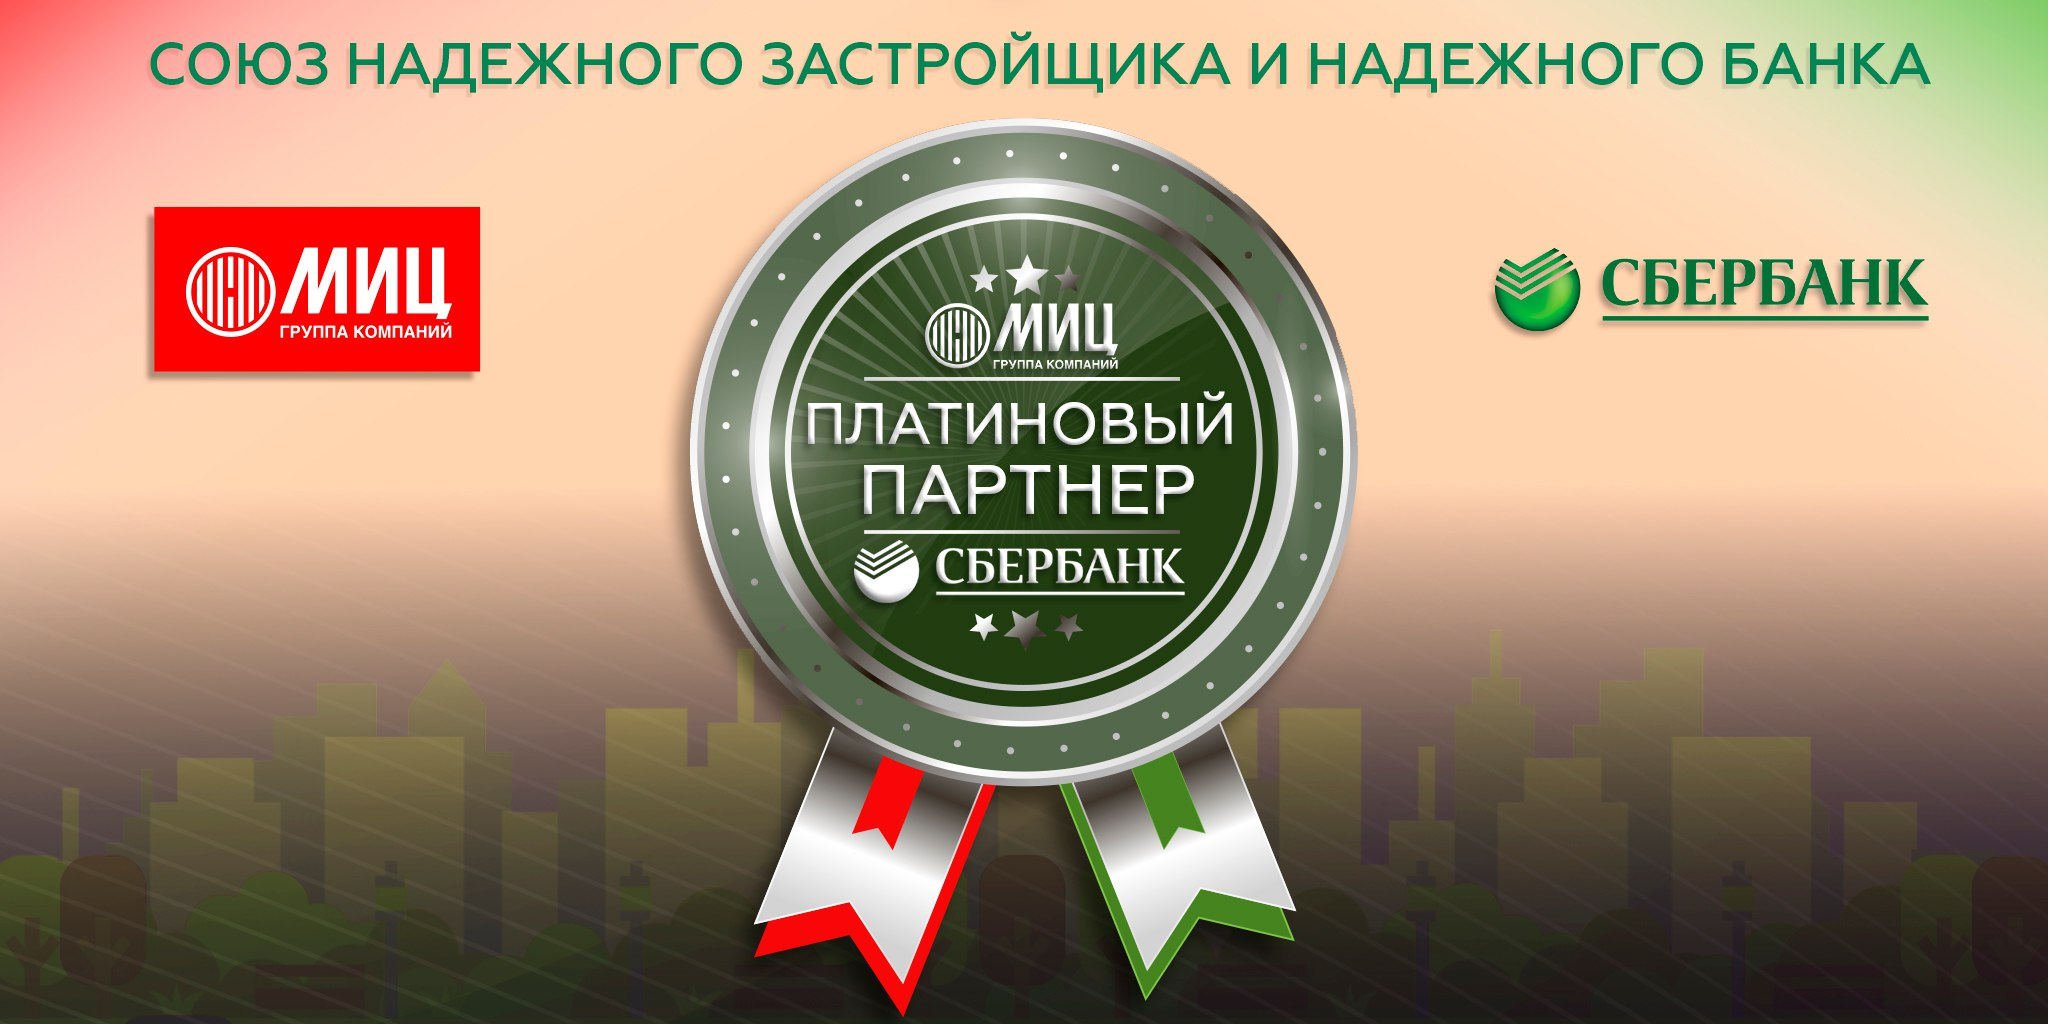 XtZMm-TpPa4.jpg